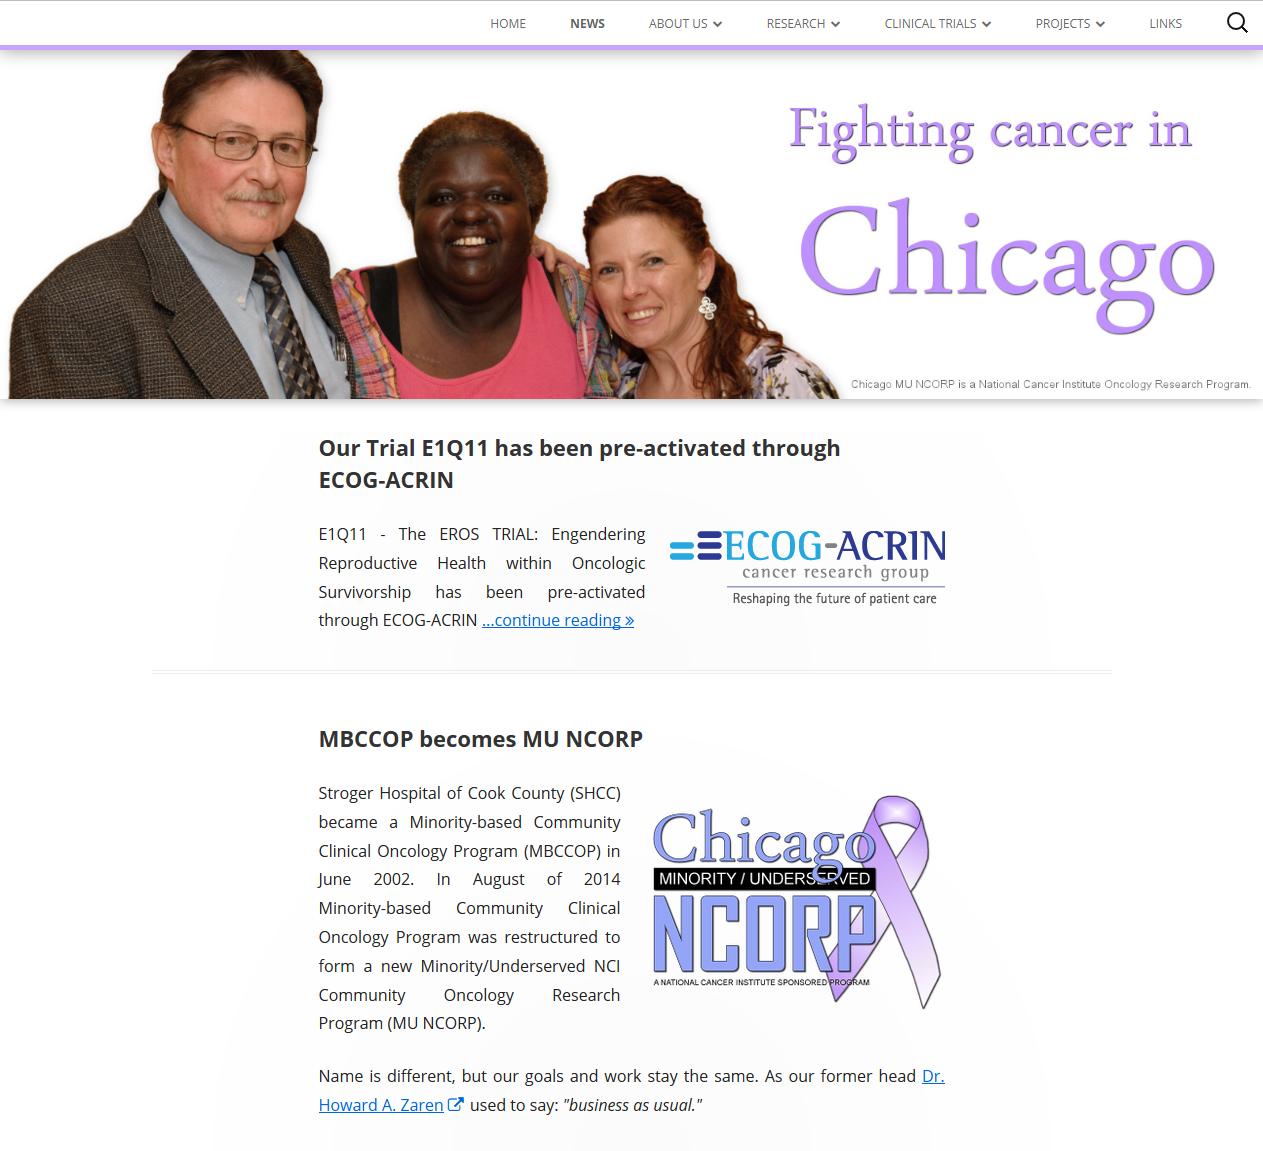 chicagomuncorp.org - 3